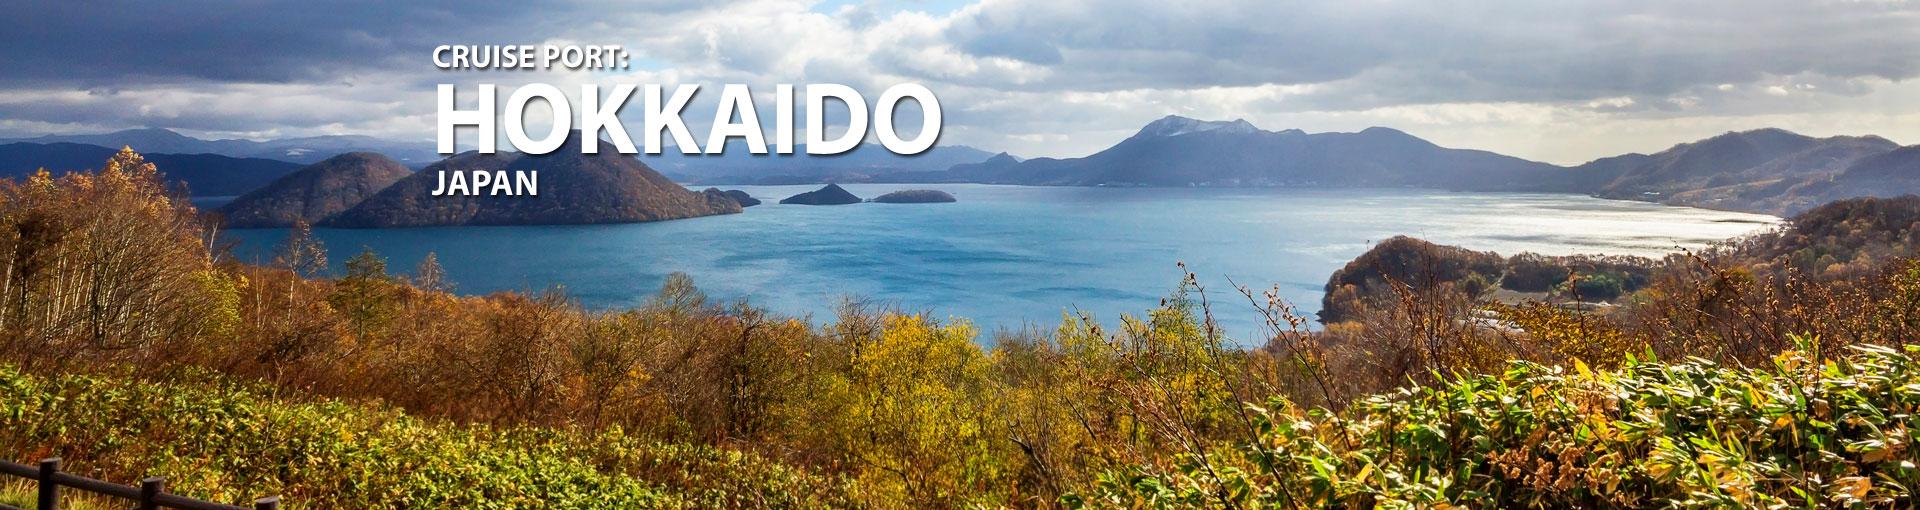 Cruises to Hokkaido, Japan